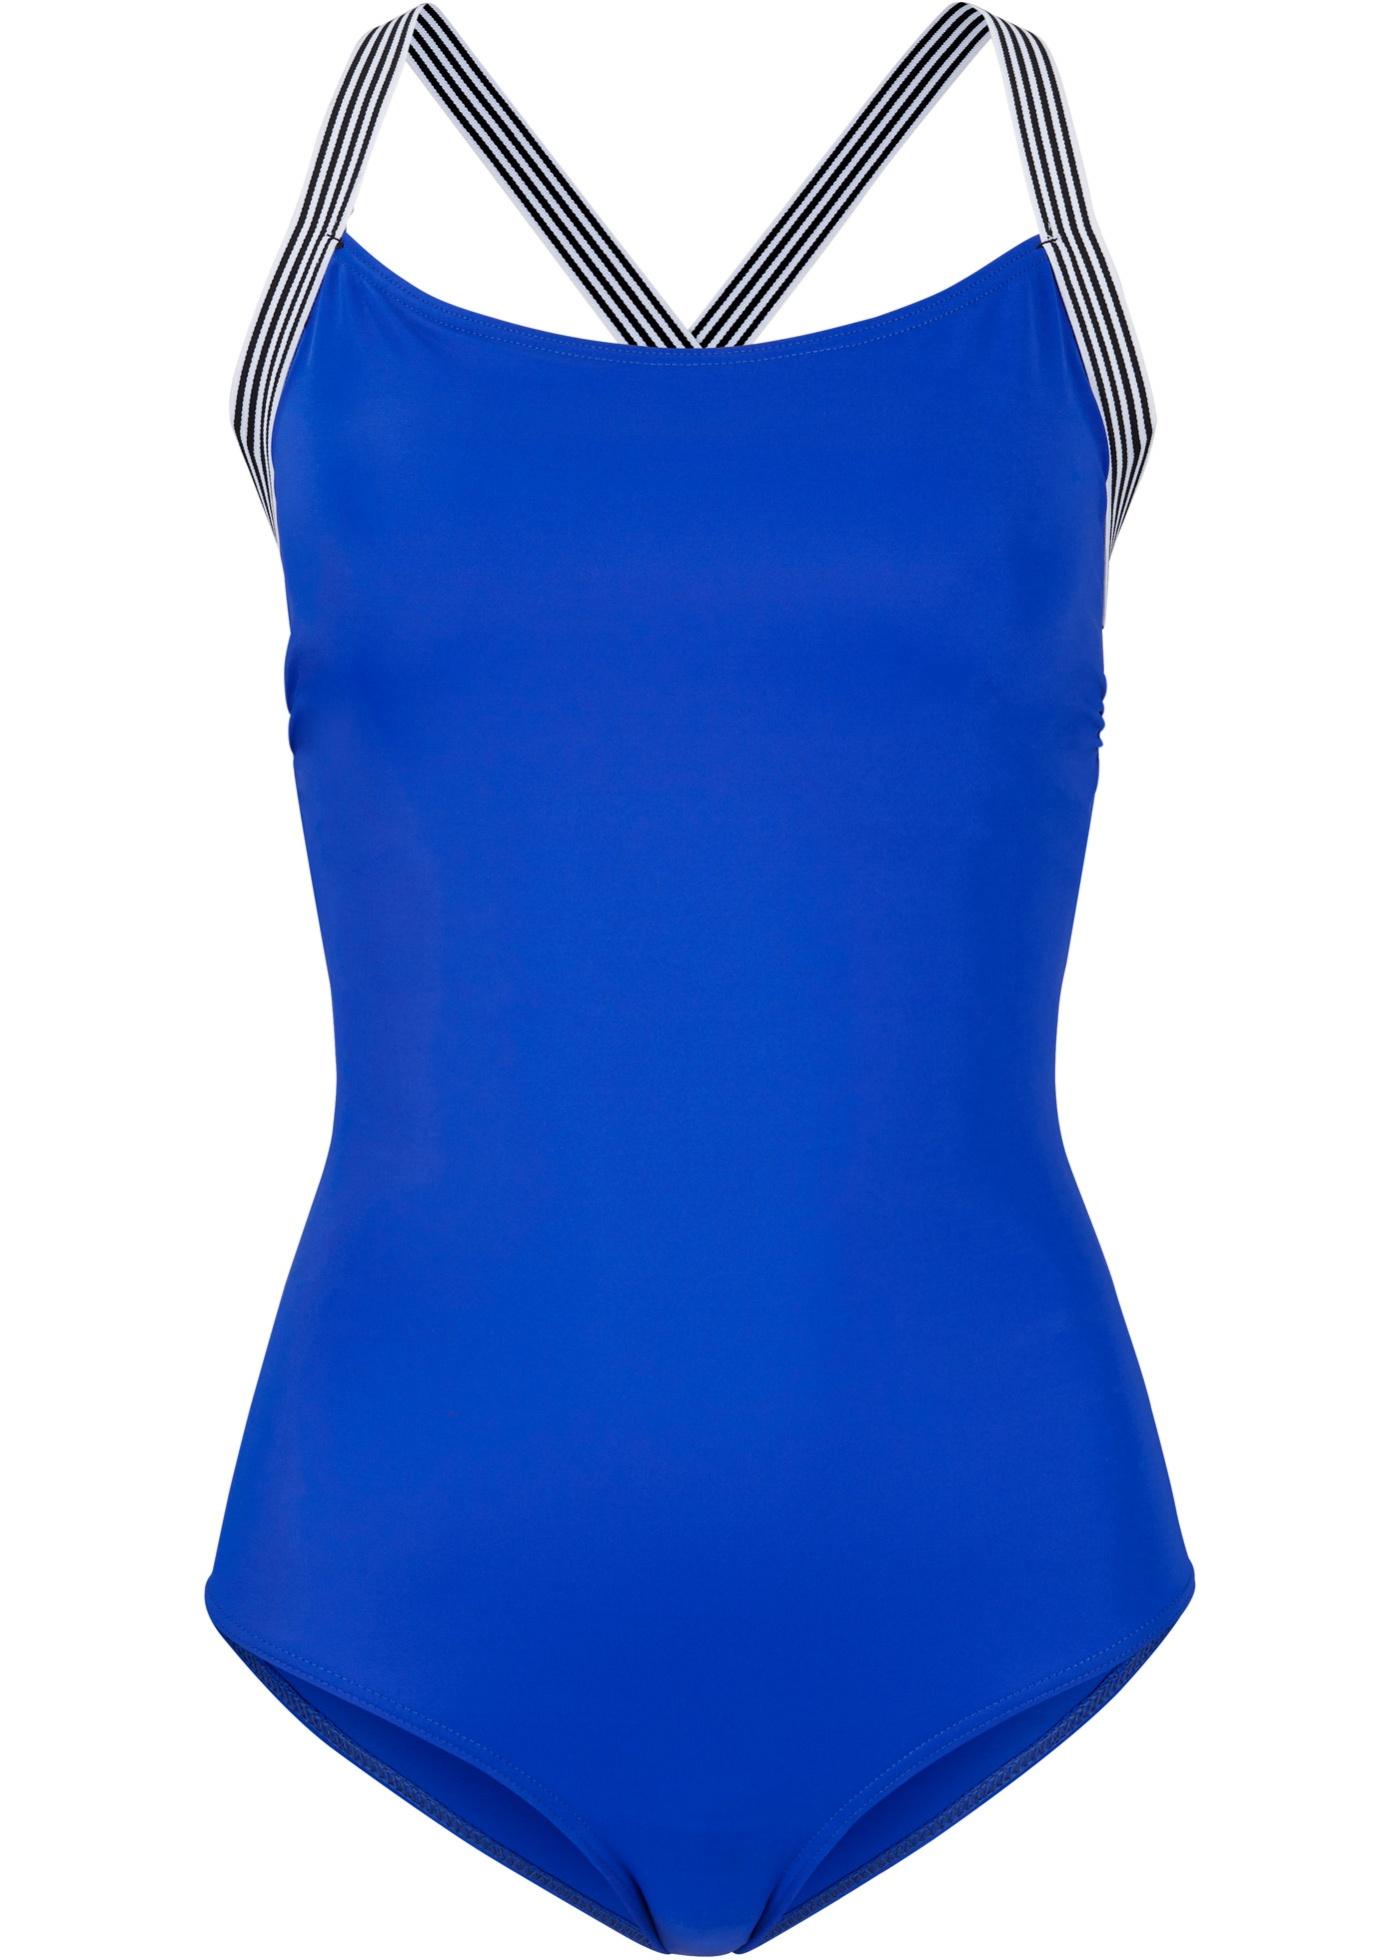 Bademode - Badeanzug › bonprix › blau  - Onlineshop Bonprix